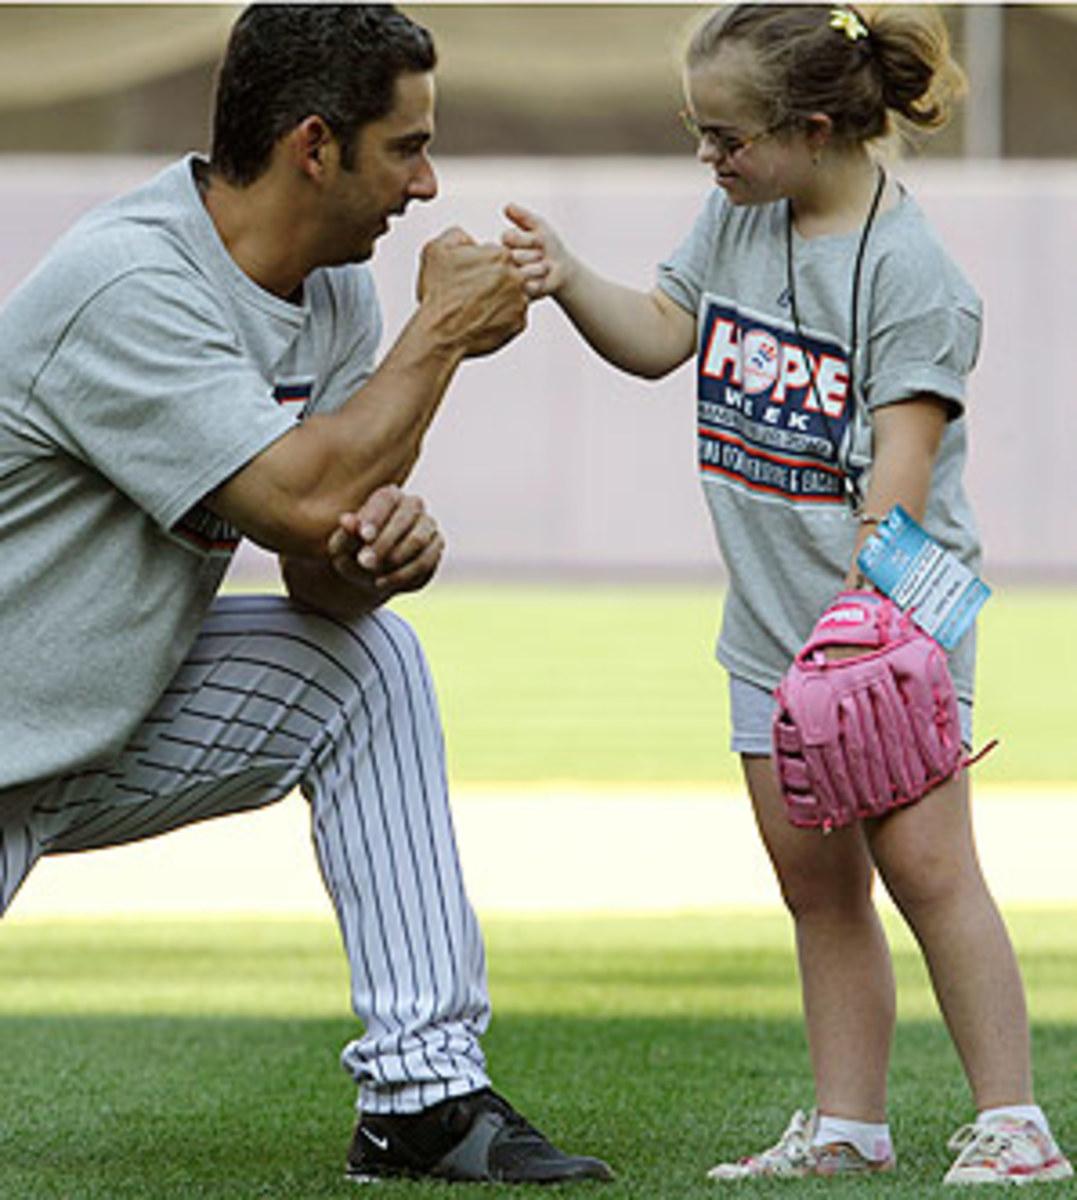 Yankees-HOPE-Week-Baseball.jpg